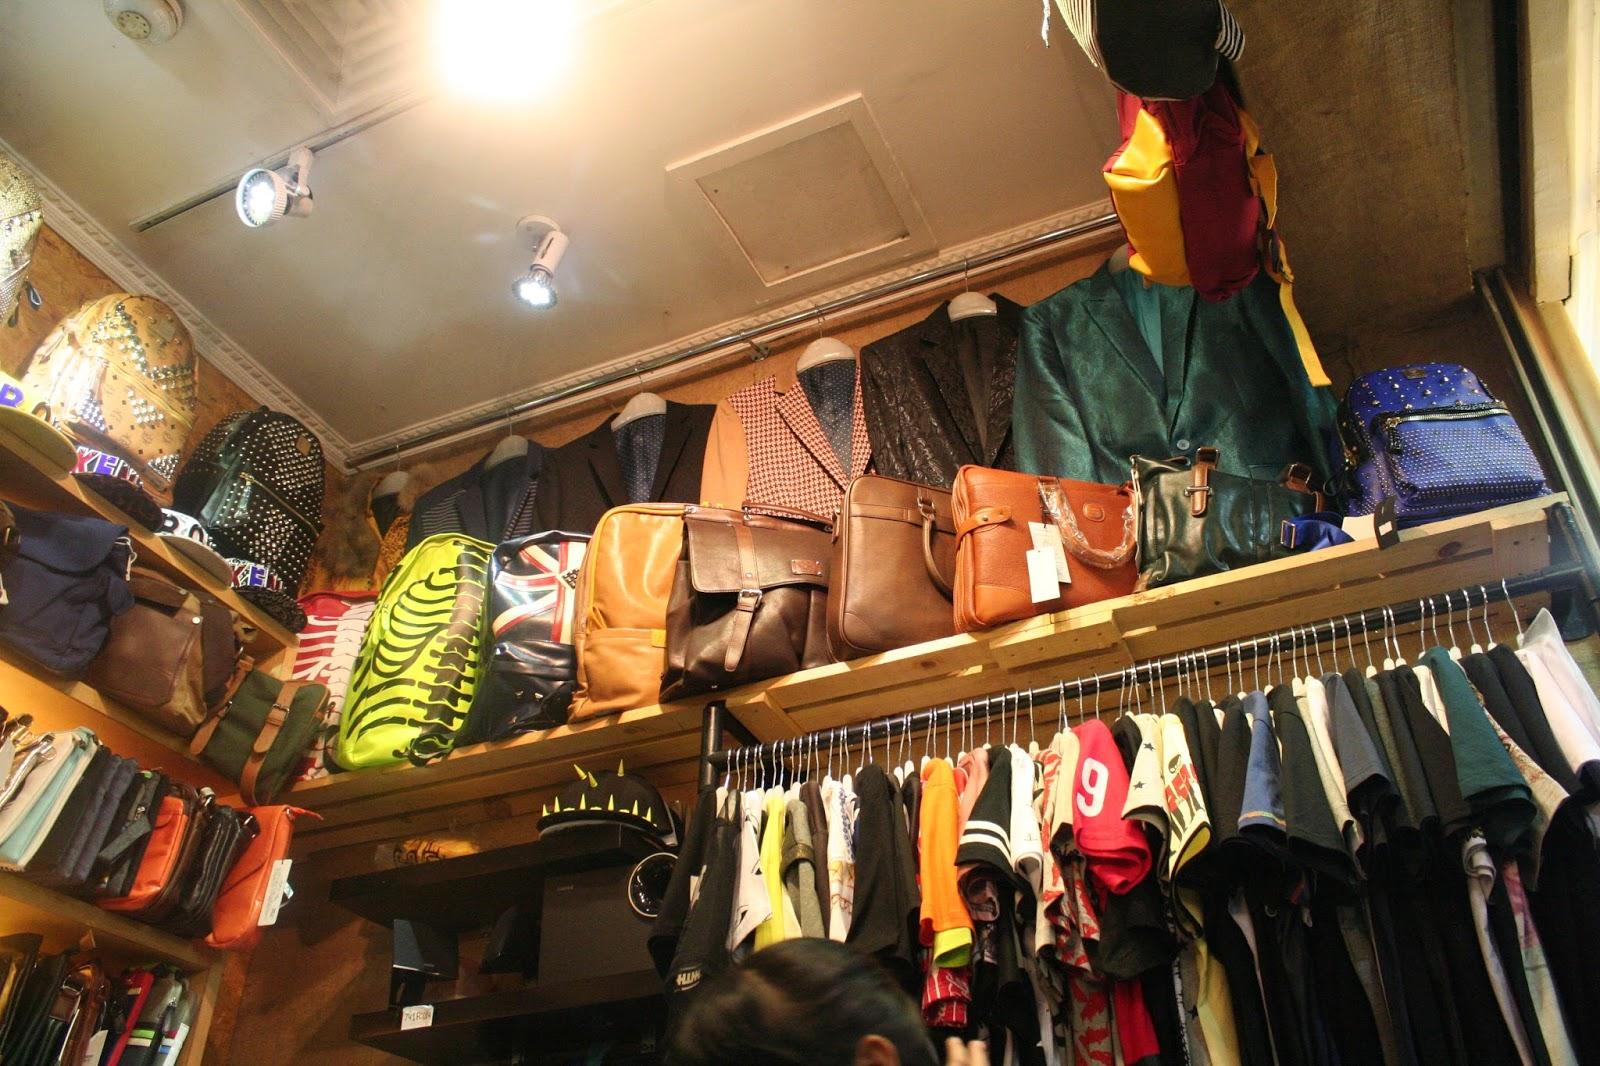 kalau dibagian atas itu tas sama blazer dibawahnya koleksi kaos-kaos 8cea61f421